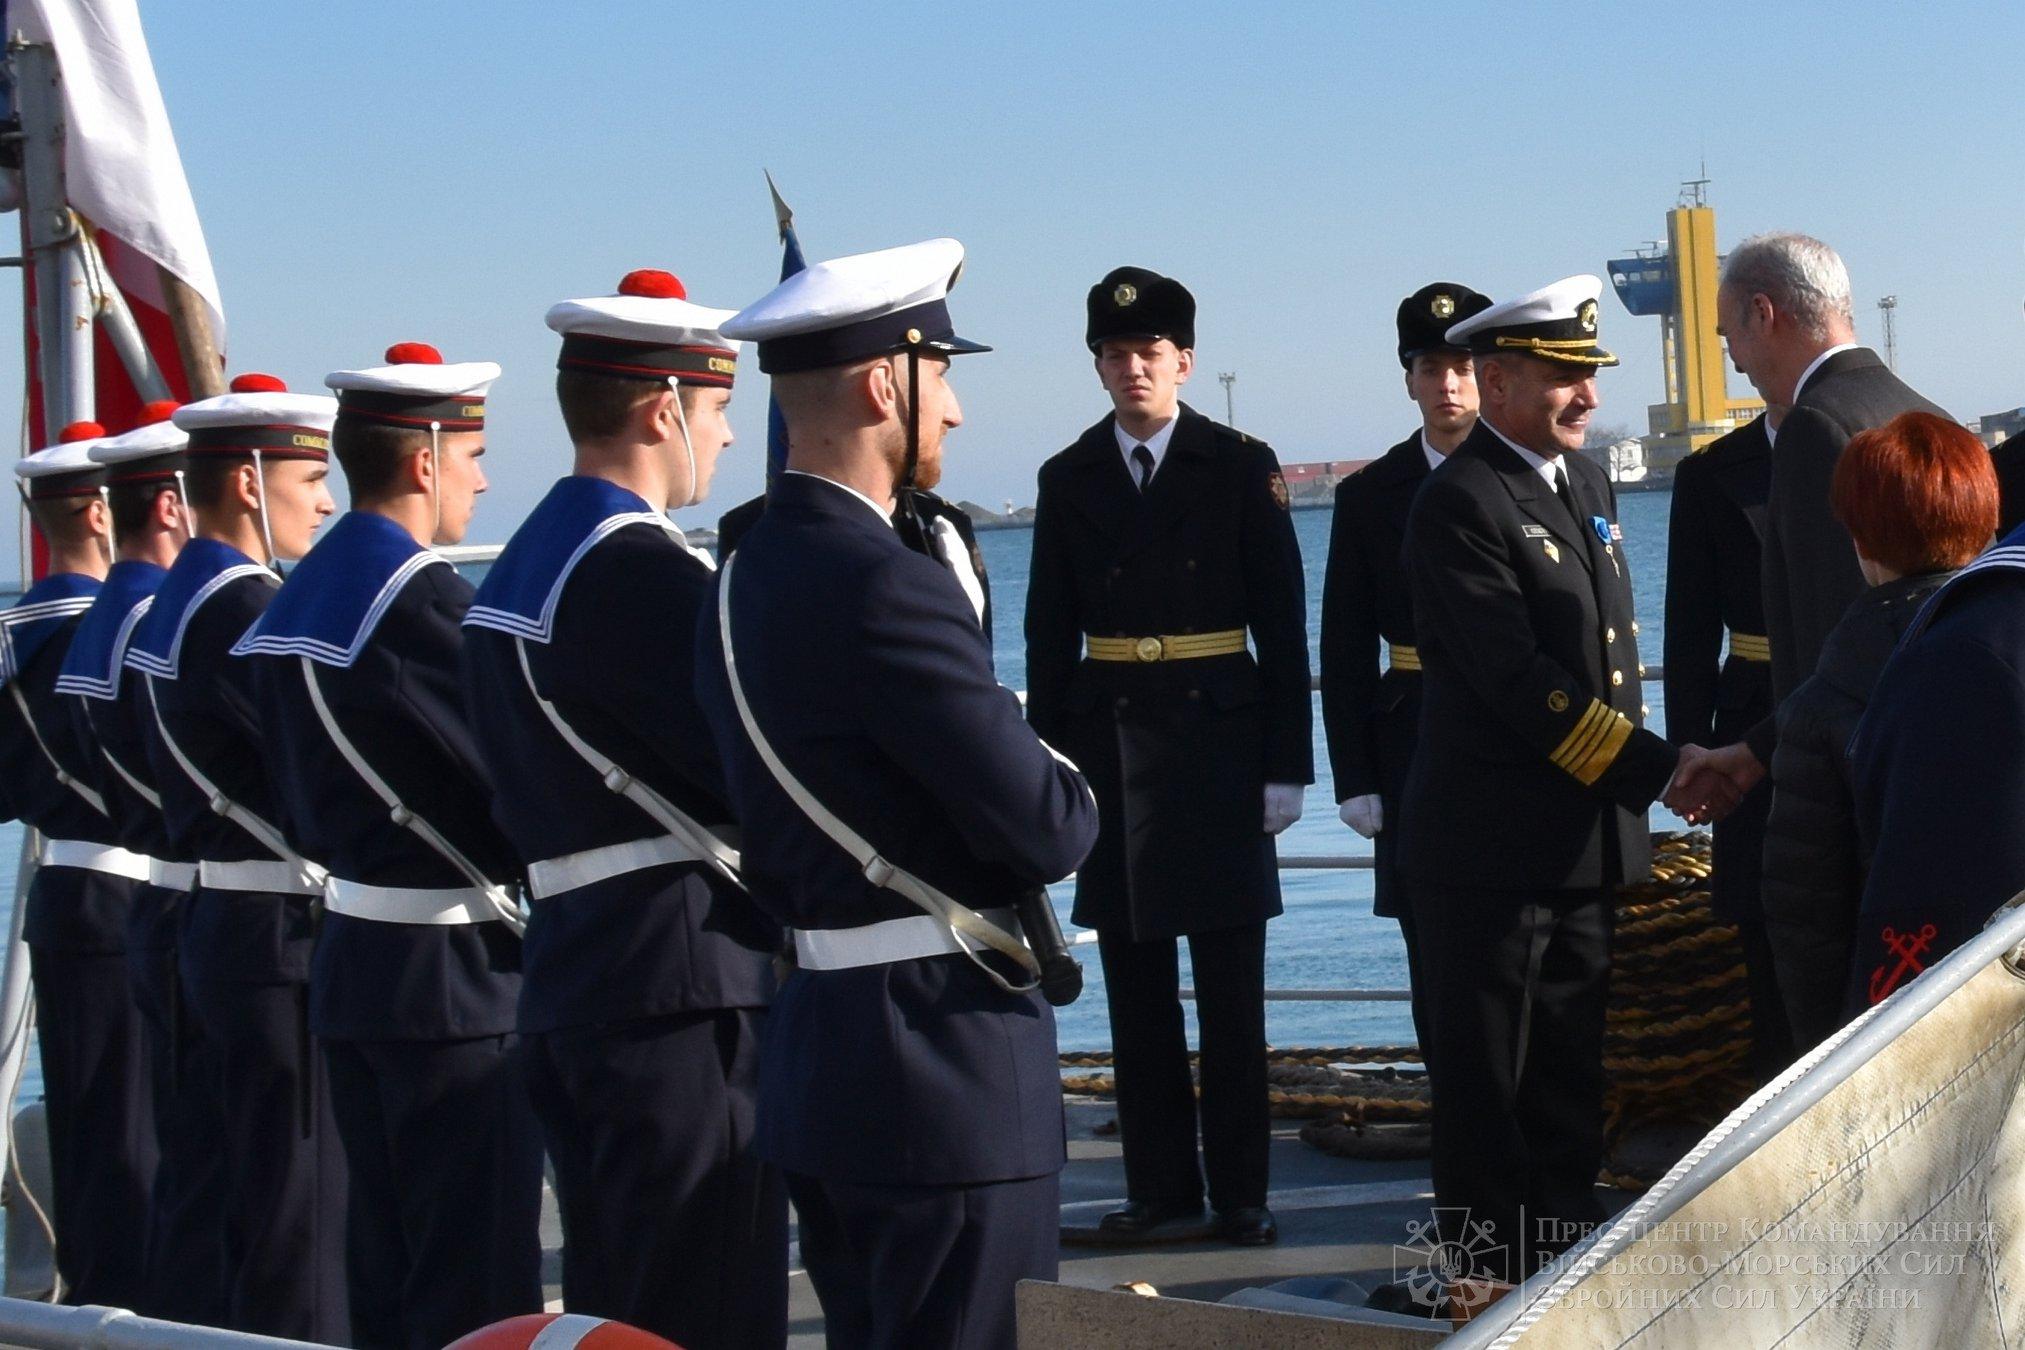 Макрон нагородив командувача ВМС України Воронченка французьким орденом